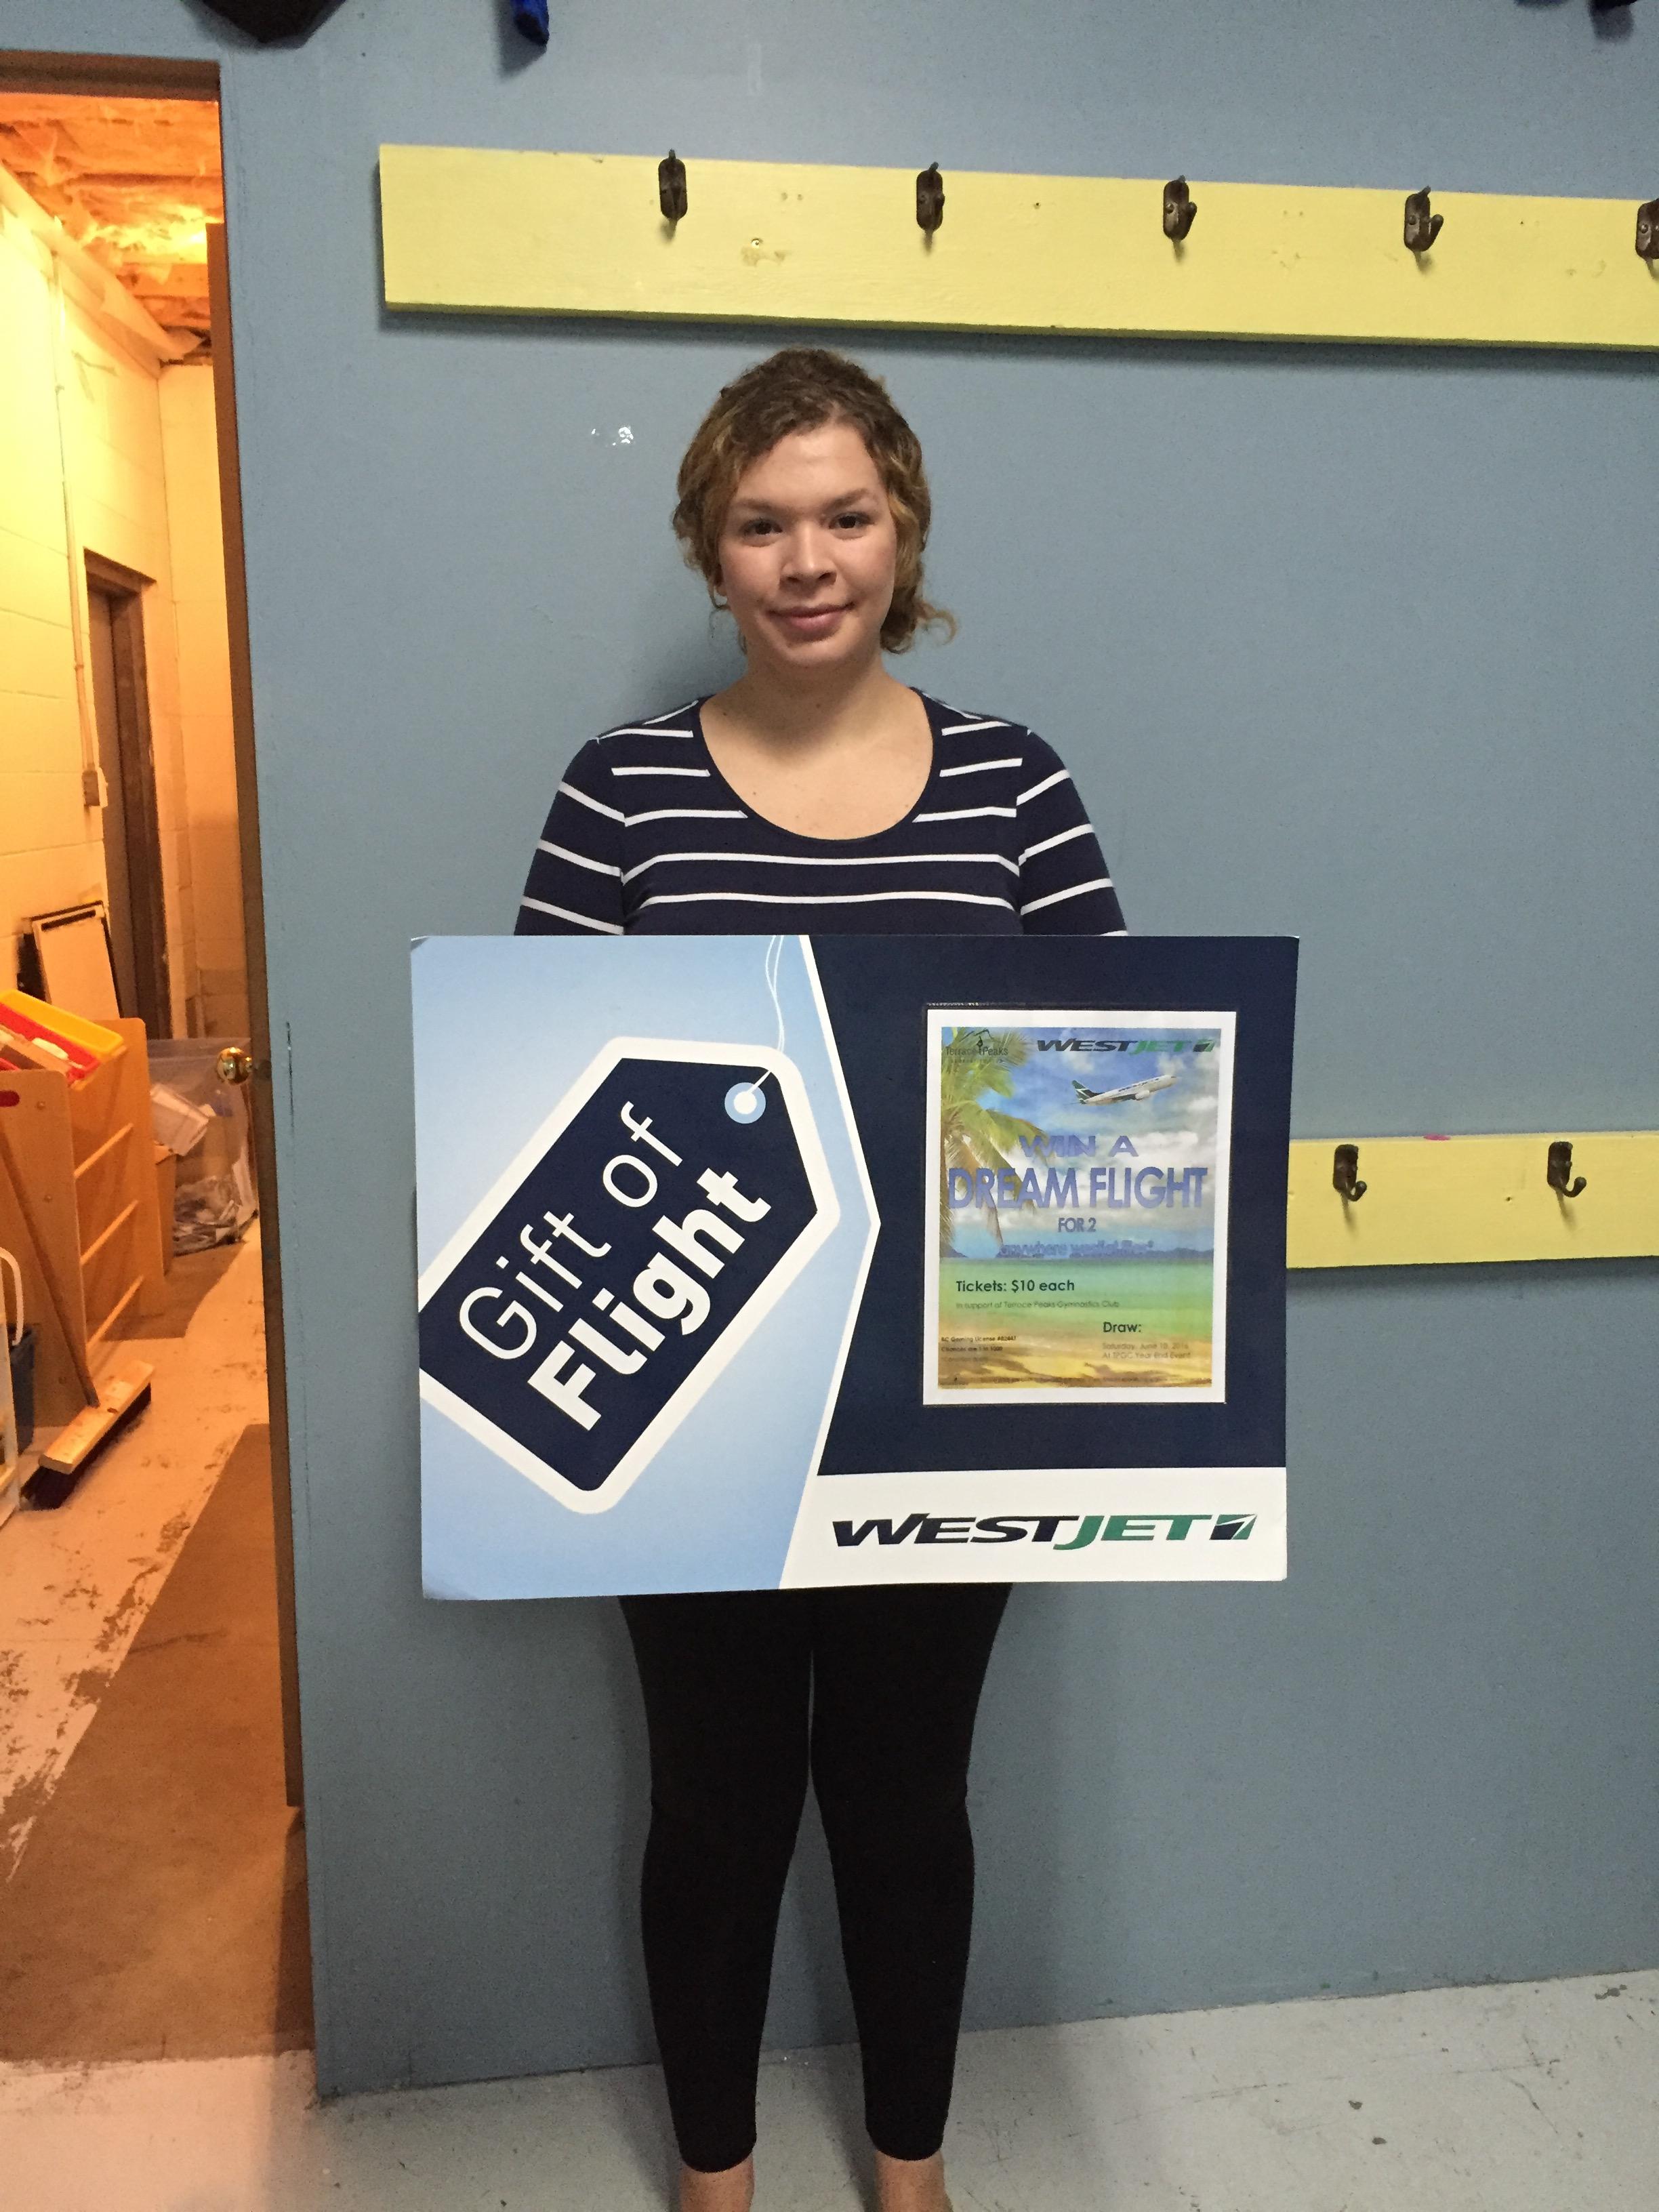 WestJet Winner 2016 - Jenna Prest